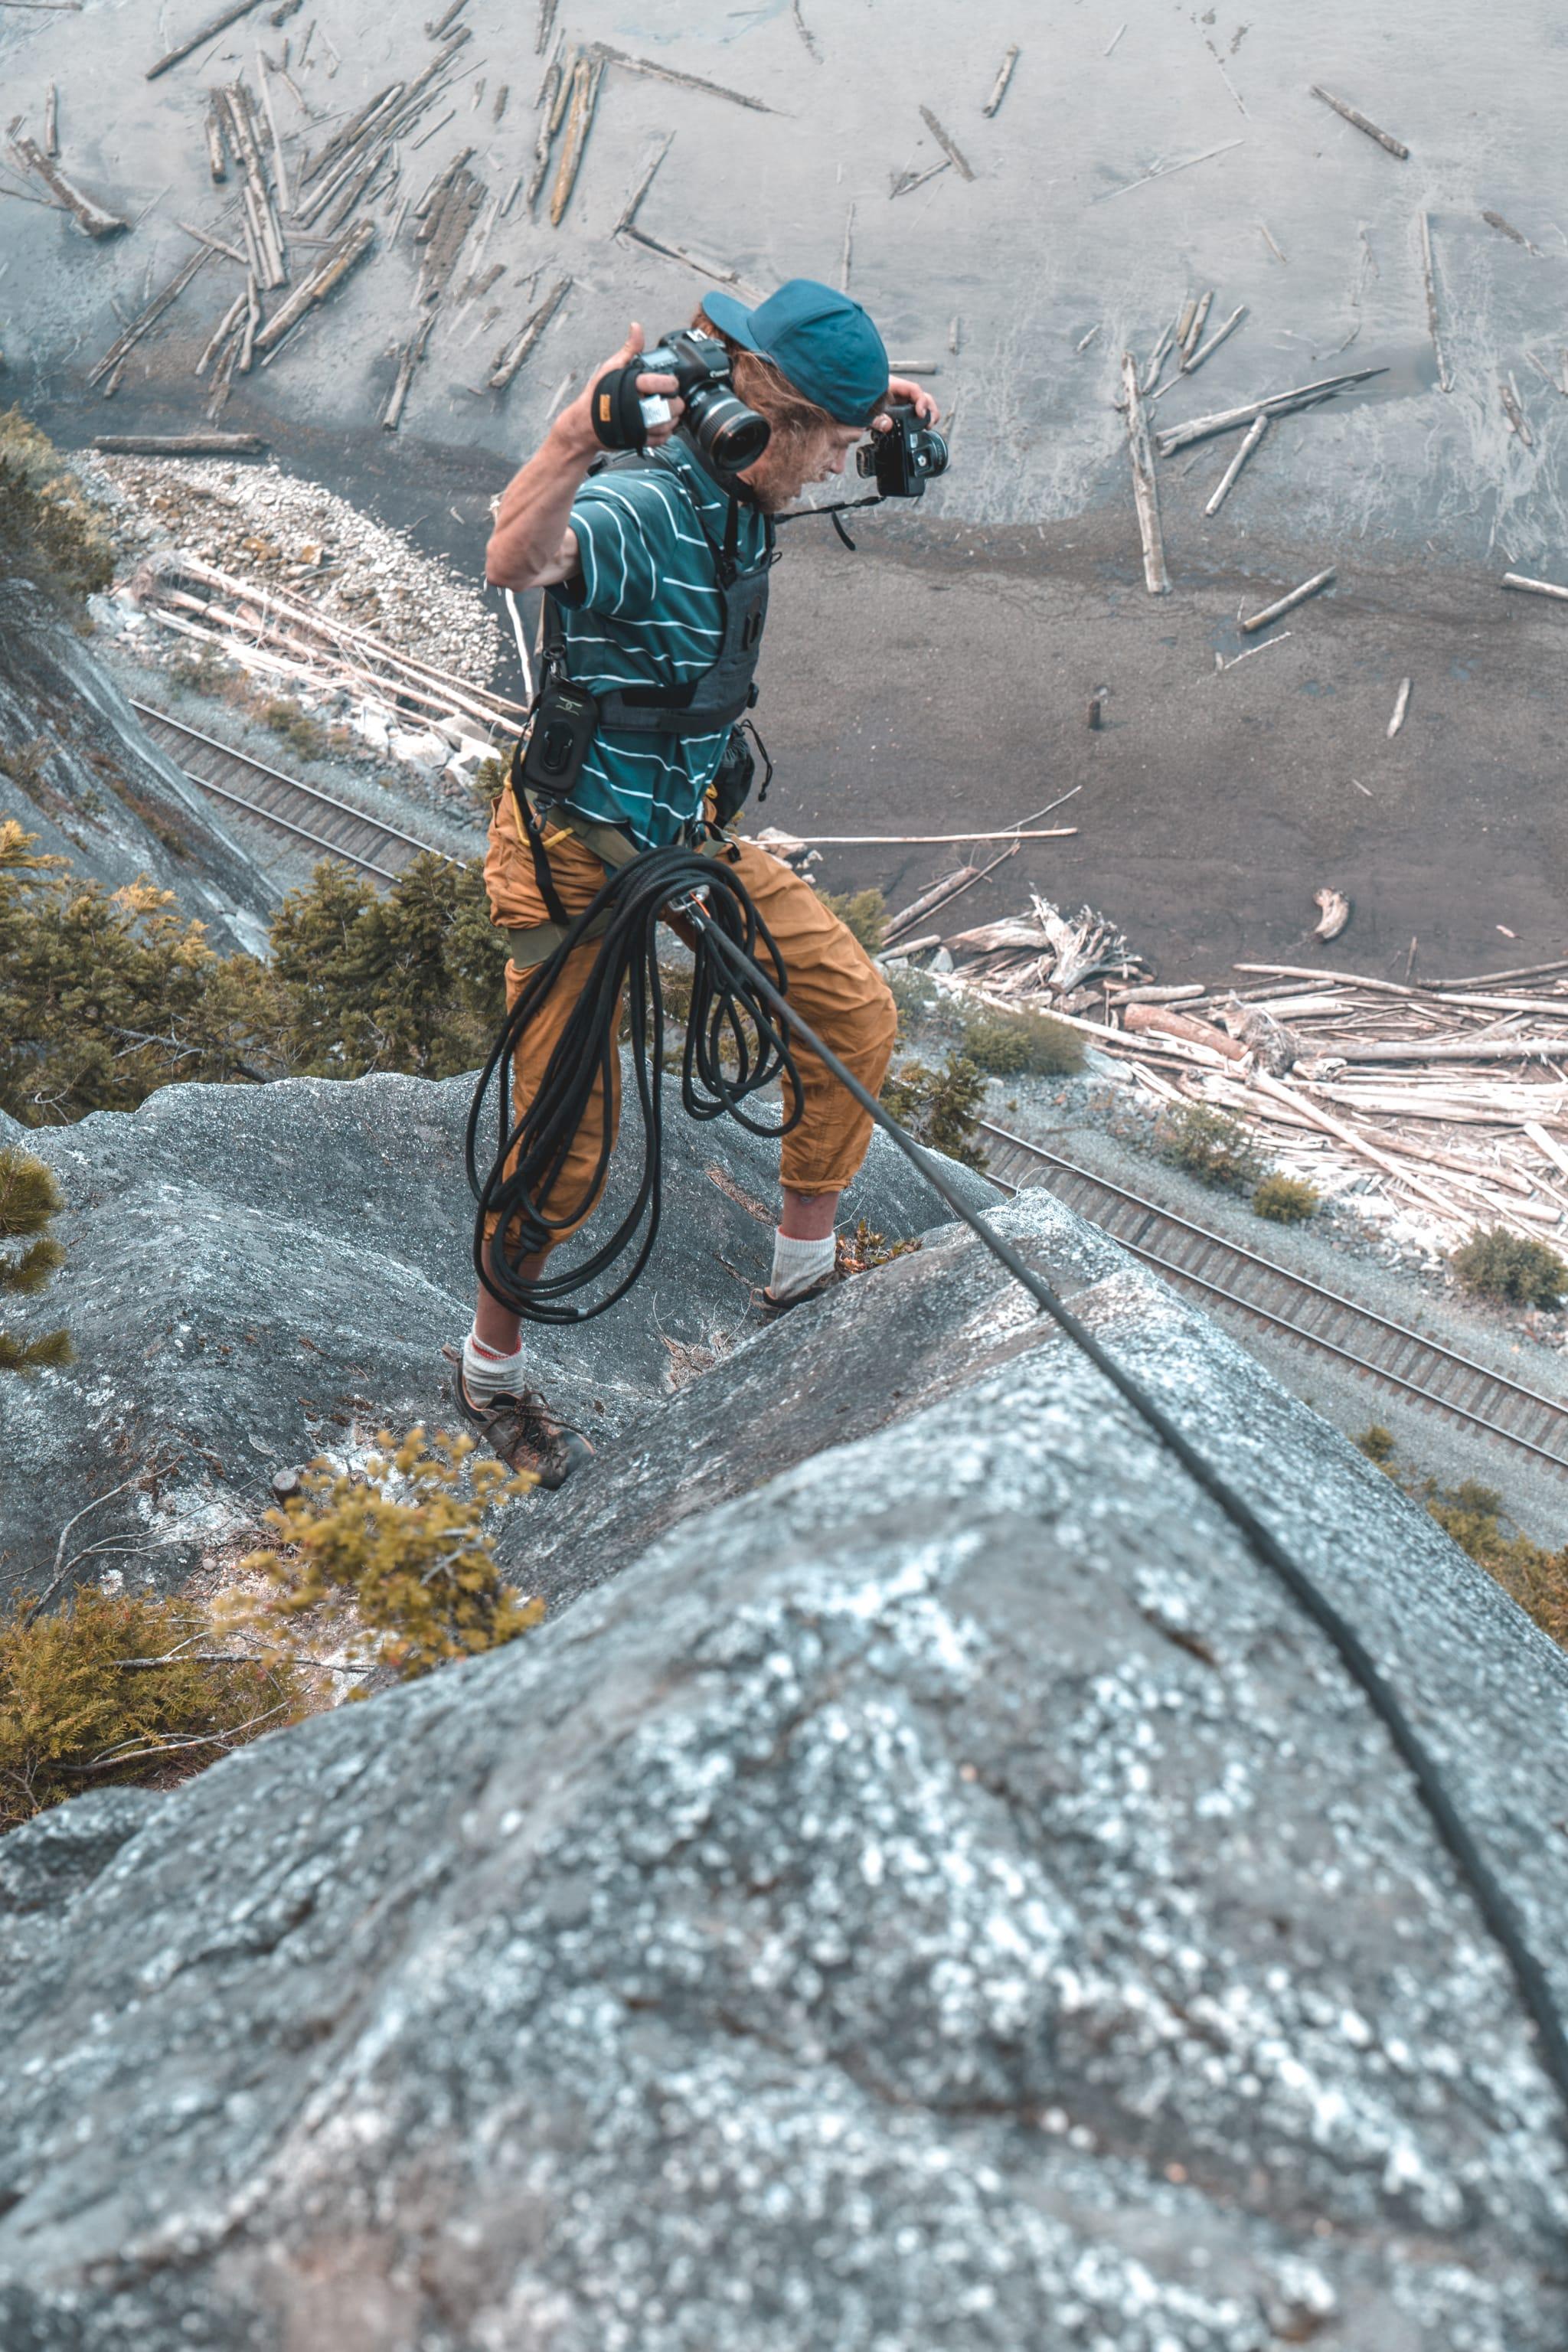 Photographer hanging on wall shooting a rock climber